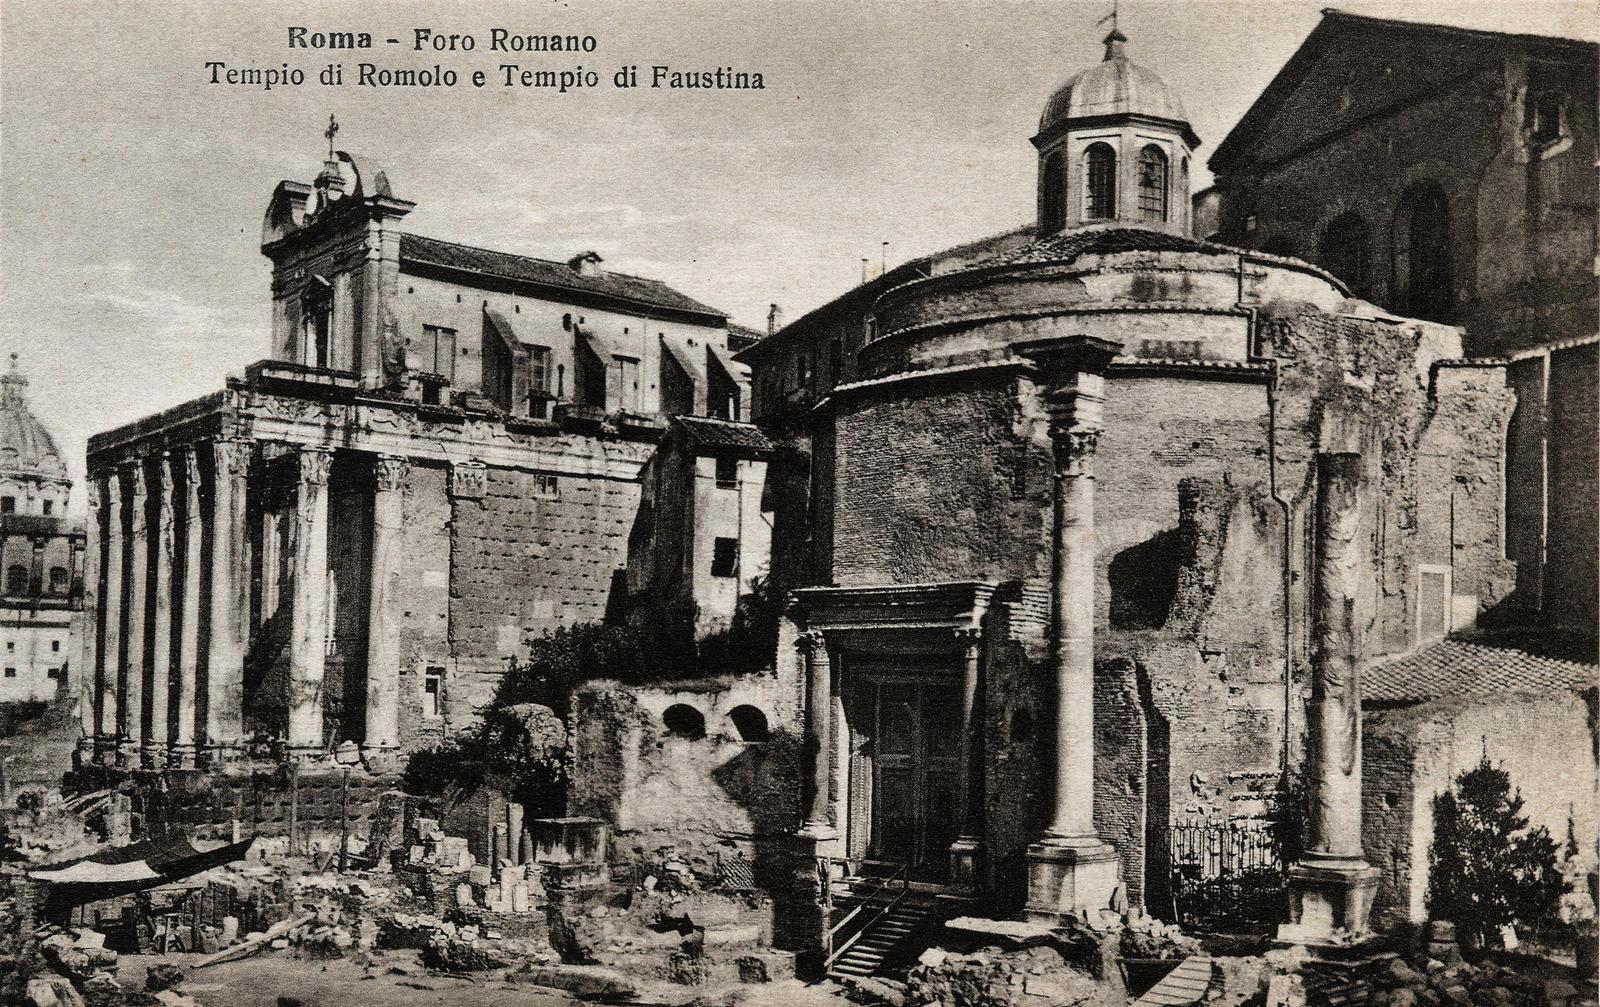 Roman Postcard 07 by pandoraicons